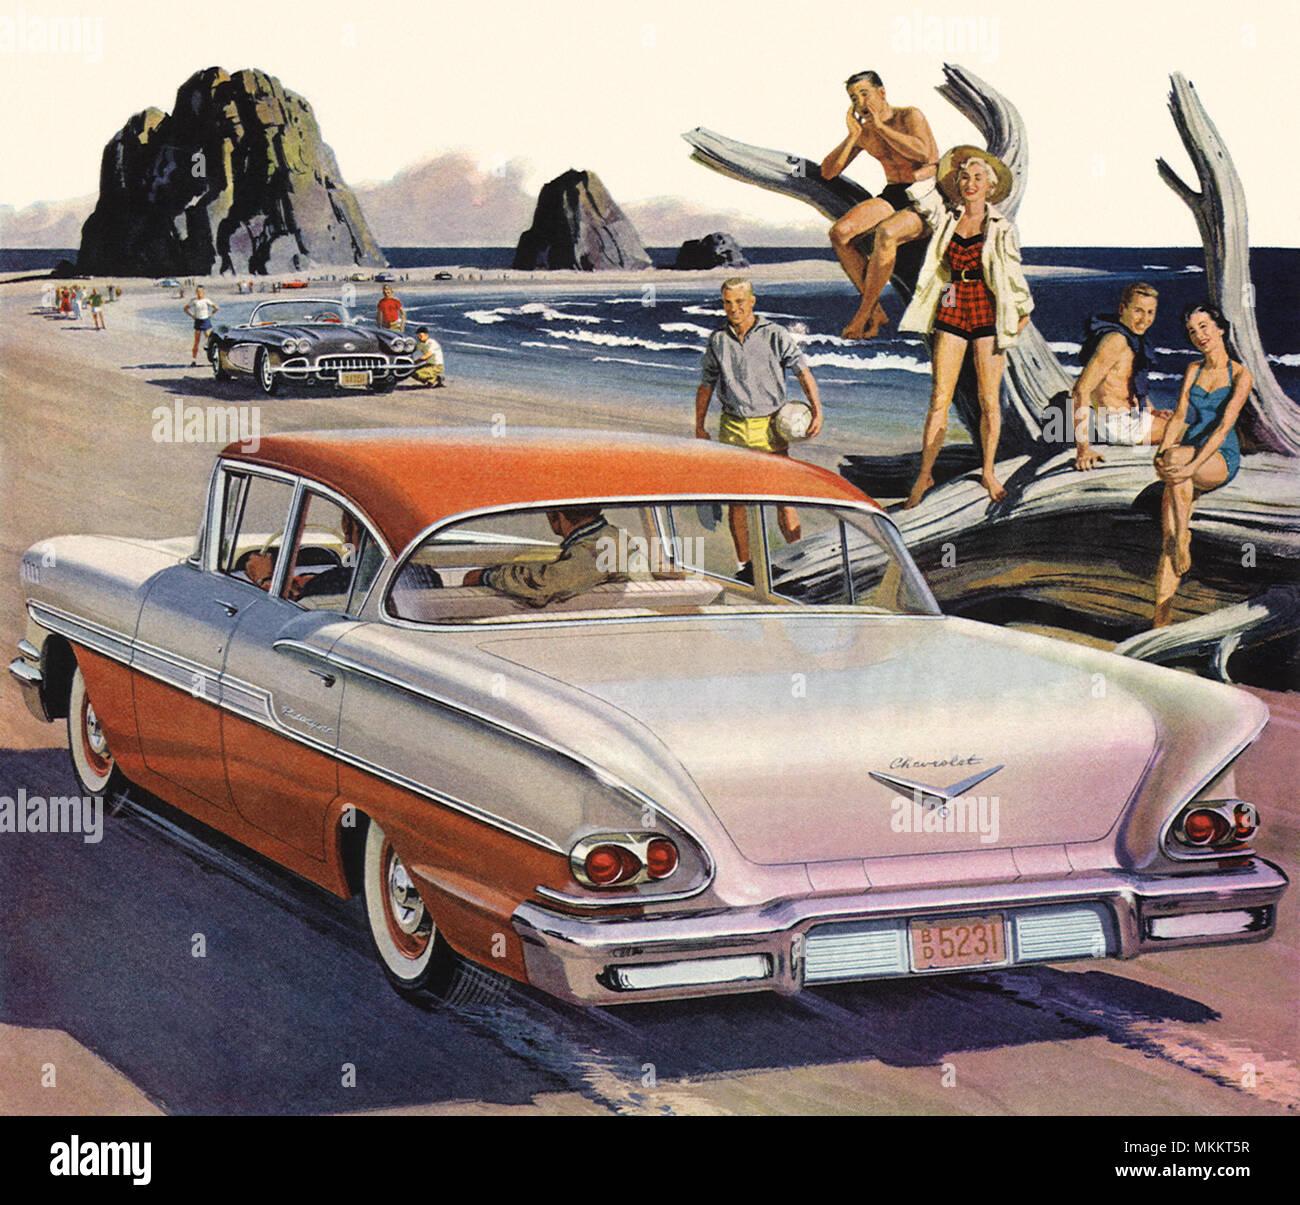 Kelebihan Chevrolet Bel Air 1958 Spesifikasi